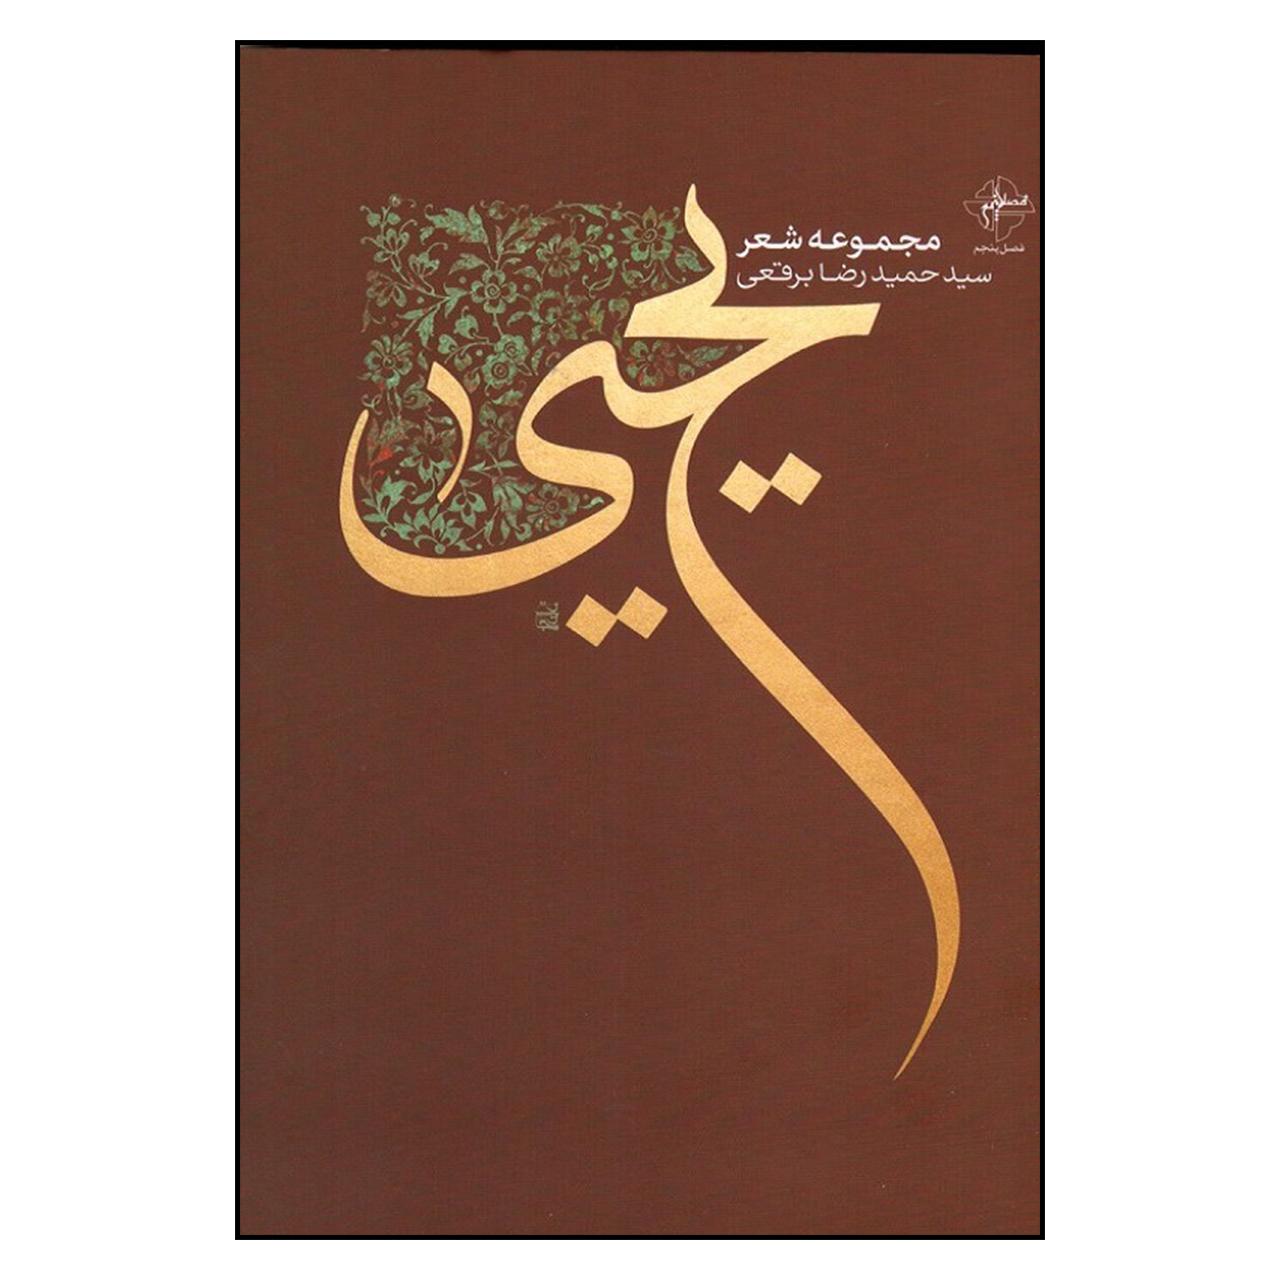 کتاب یحیی اثر سید حمیدرضا برقعی انتشارات فصل پنجم